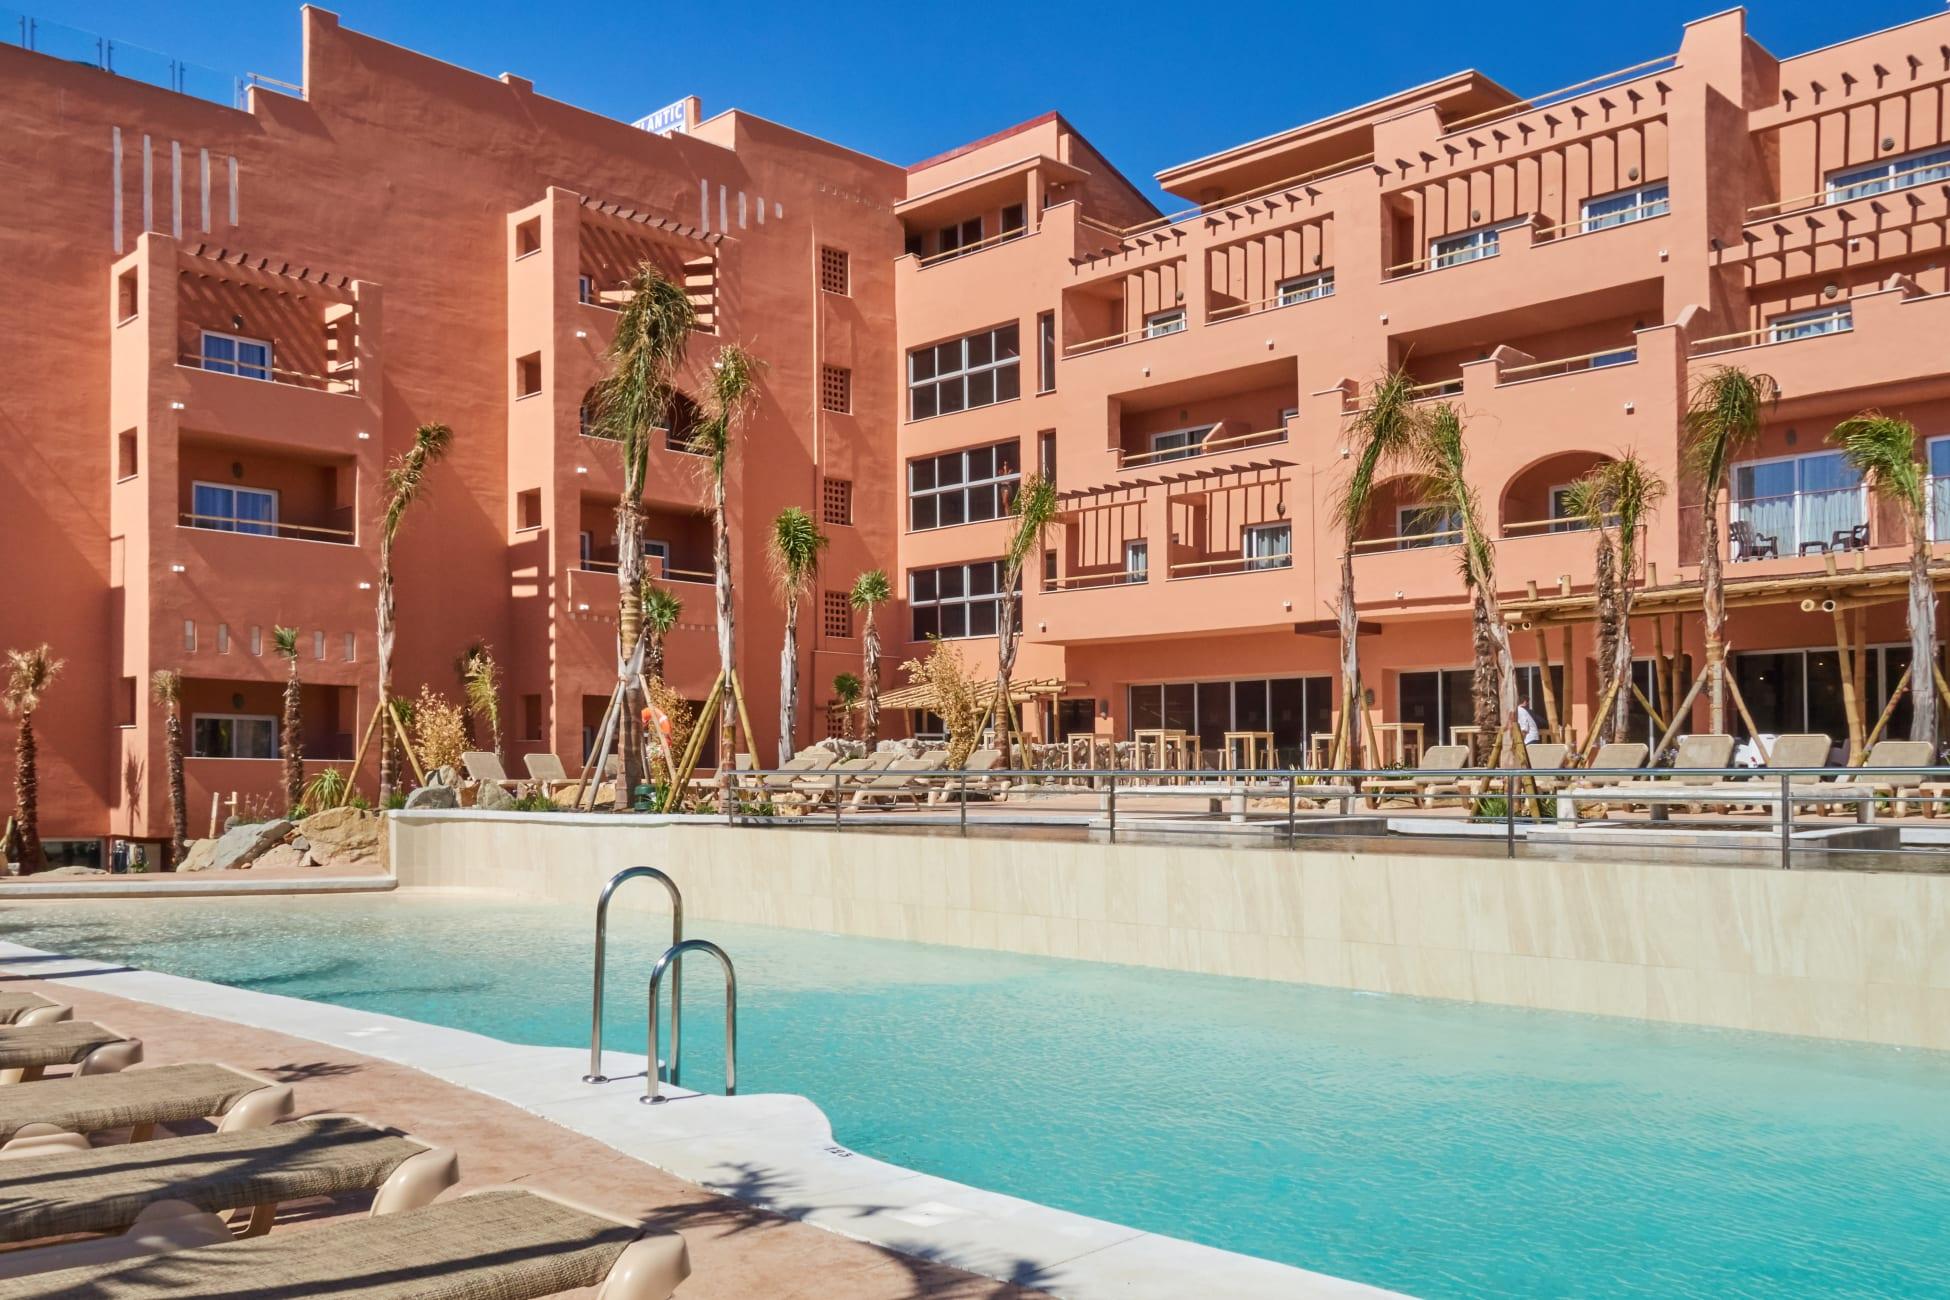 Hotel The Tarifa Lances